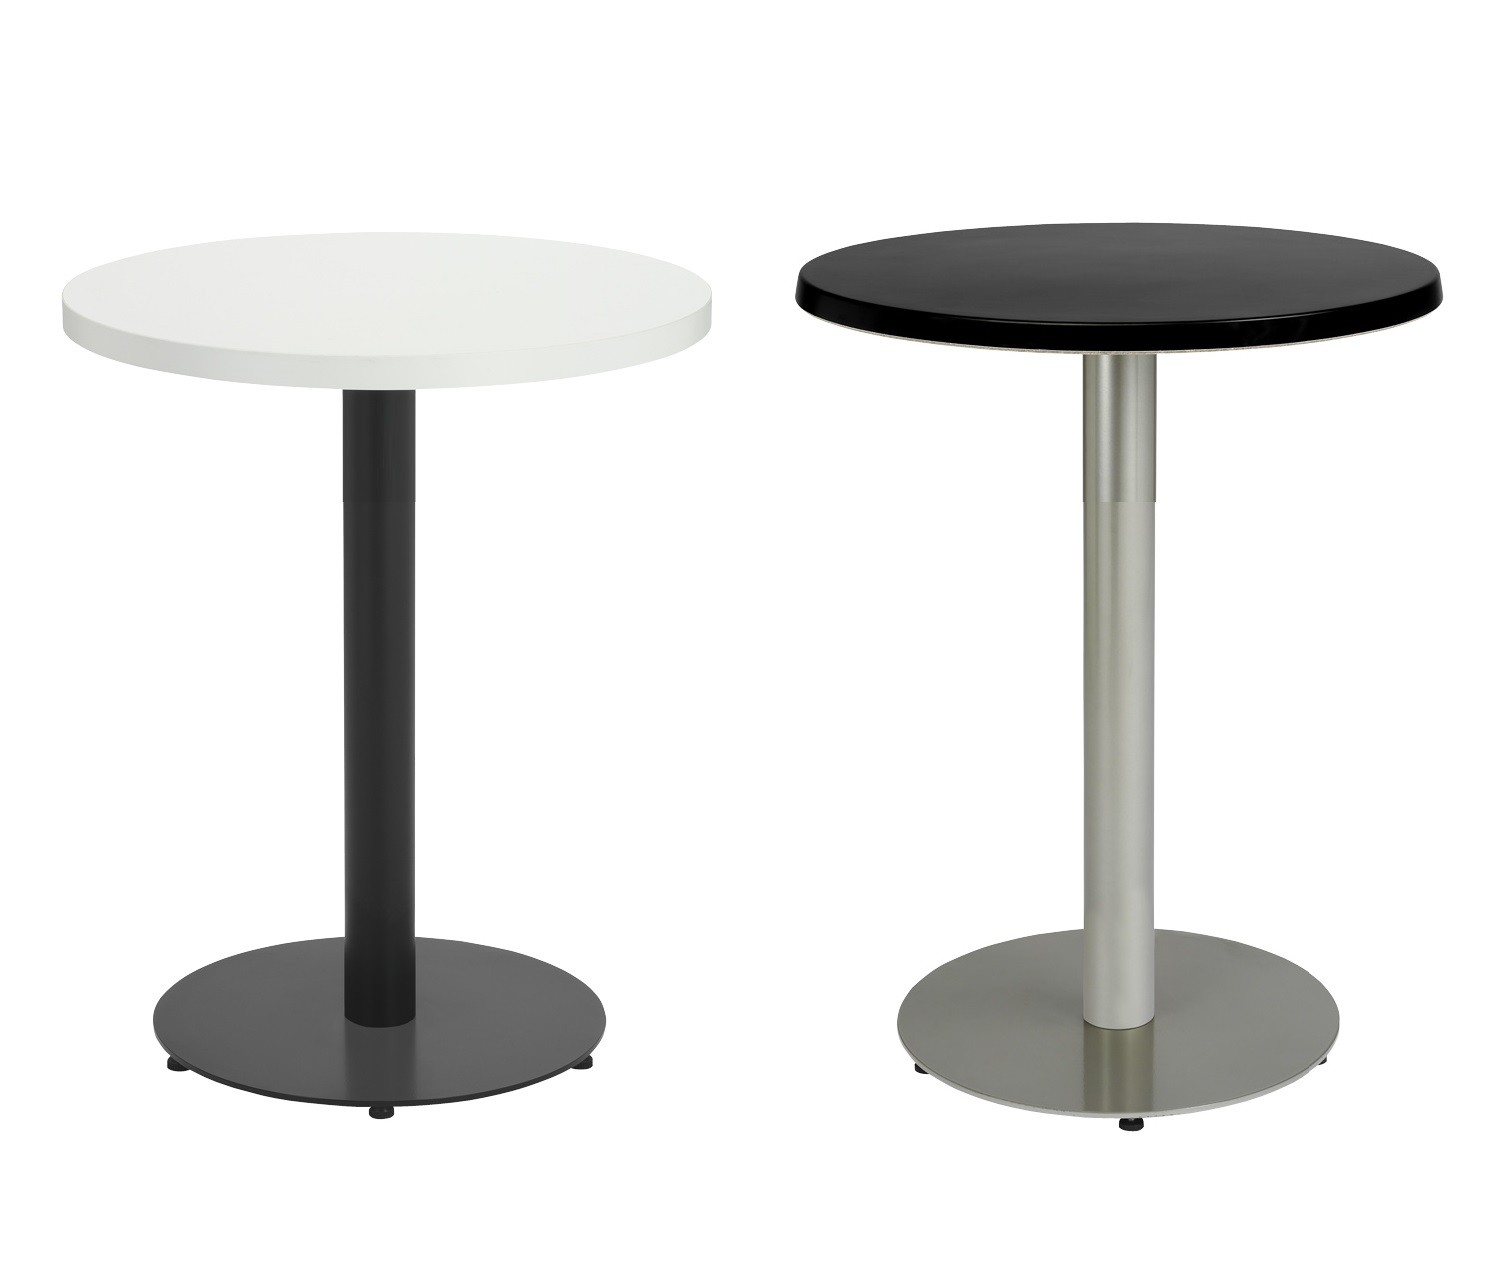 Mobiliario hostelería Mesas redondas para restaurantes, bares y ...